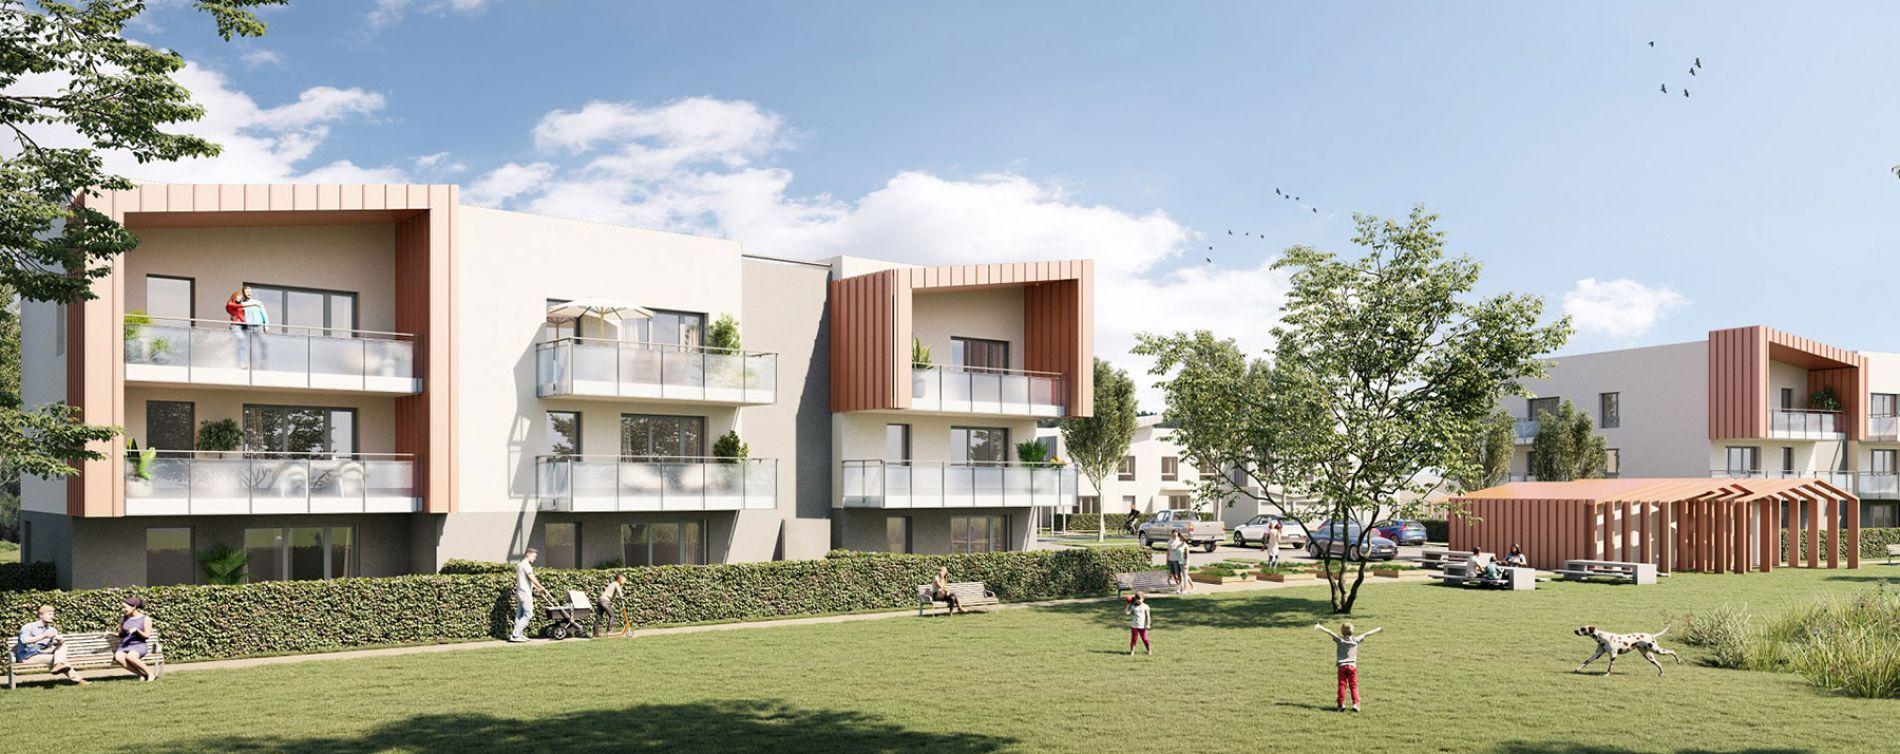 Beynost : programme immobilier neuve « Serenity »